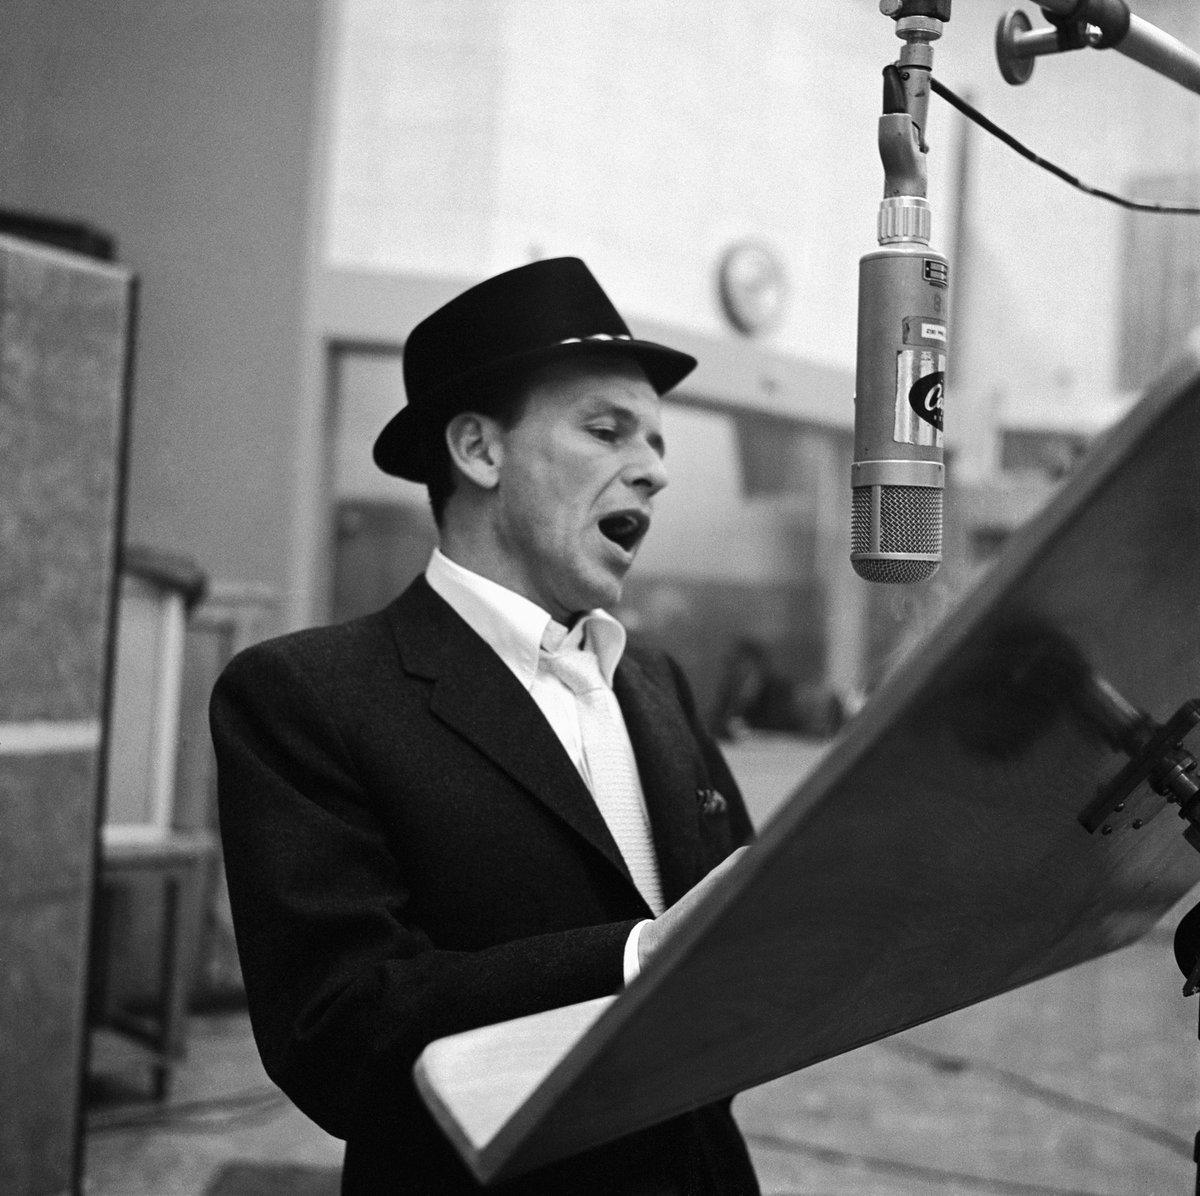 """May you live to be 100 and may the last words you hear be mine""-#FrankSinatra  Happy Birthday Frank! #Sinatra100 https://t.co/s51b28yTKe"